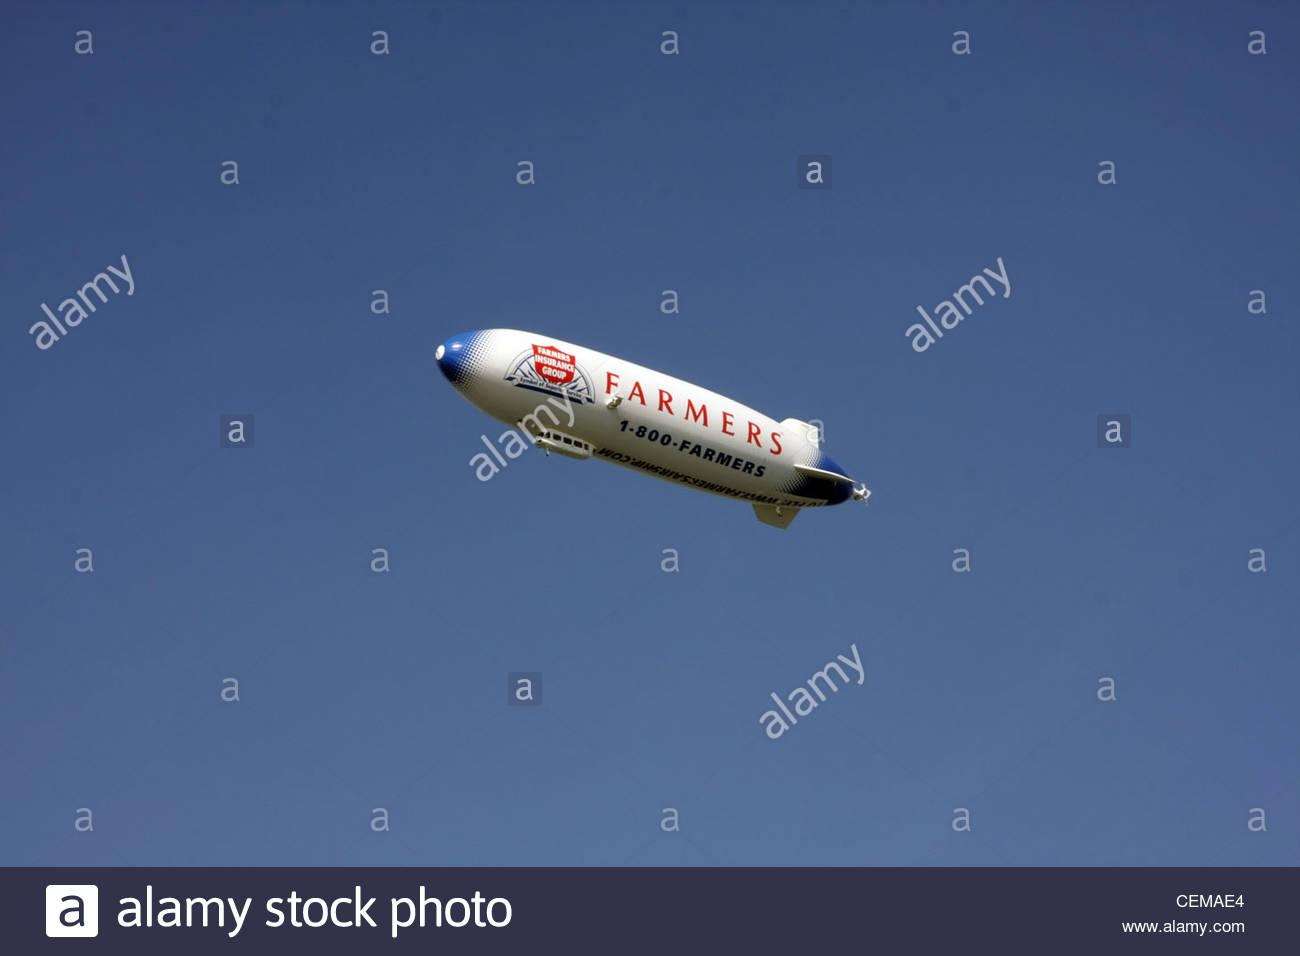 Farmers Insurance advertising blimp airship - Stock Image